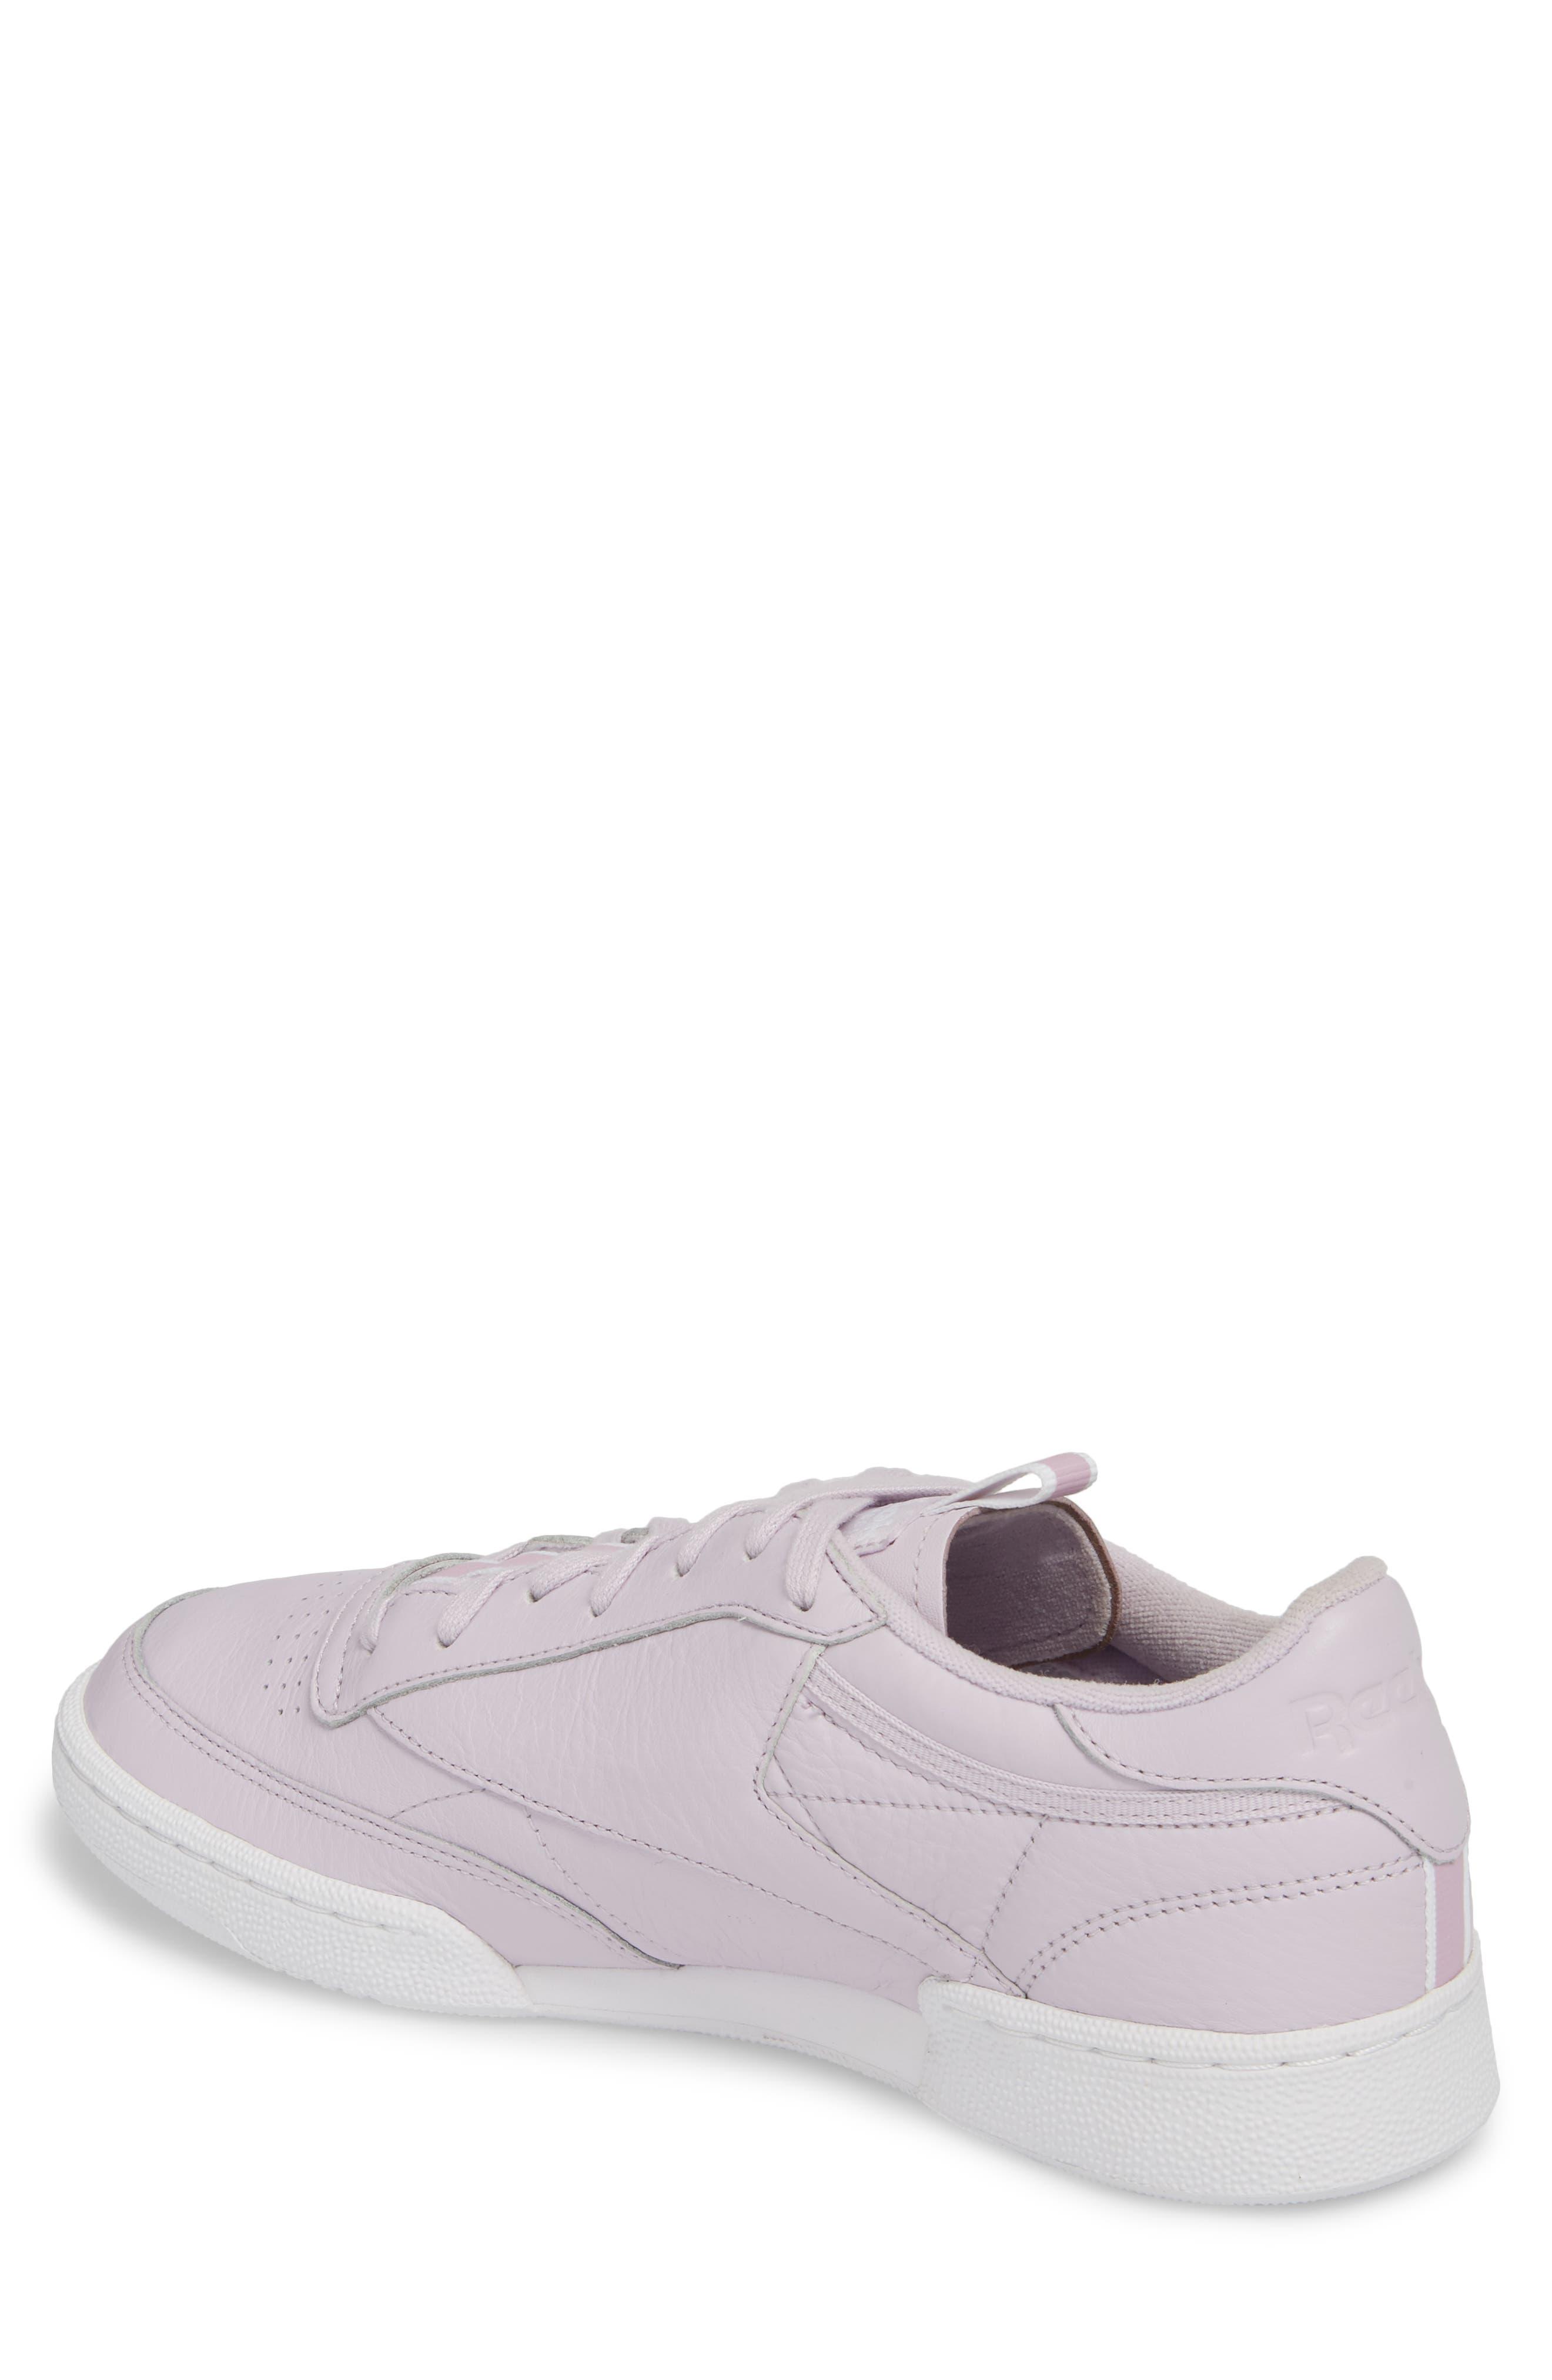 Club C 85 RT Sneaker,                             Alternate thumbnail 2, color,